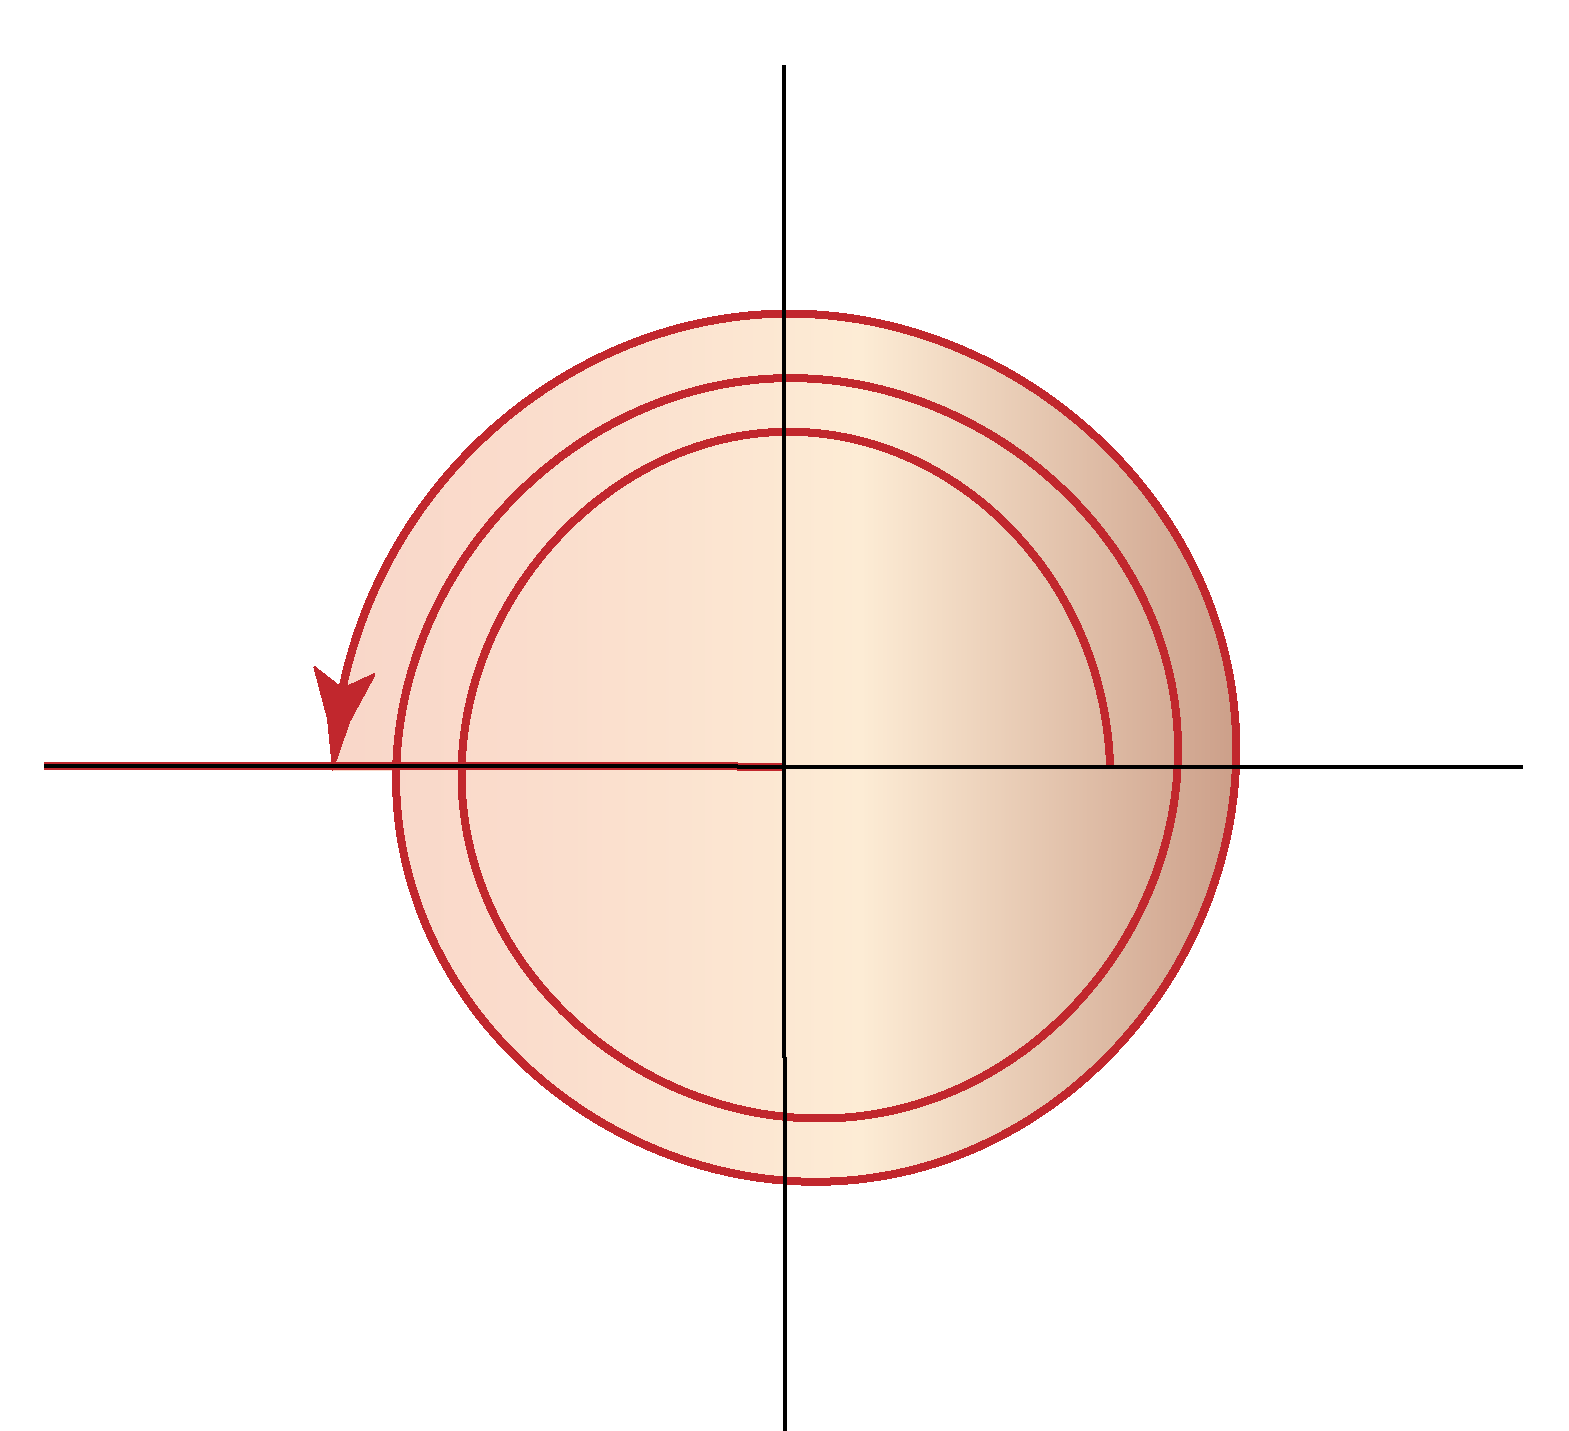 sin 900 in unit circle